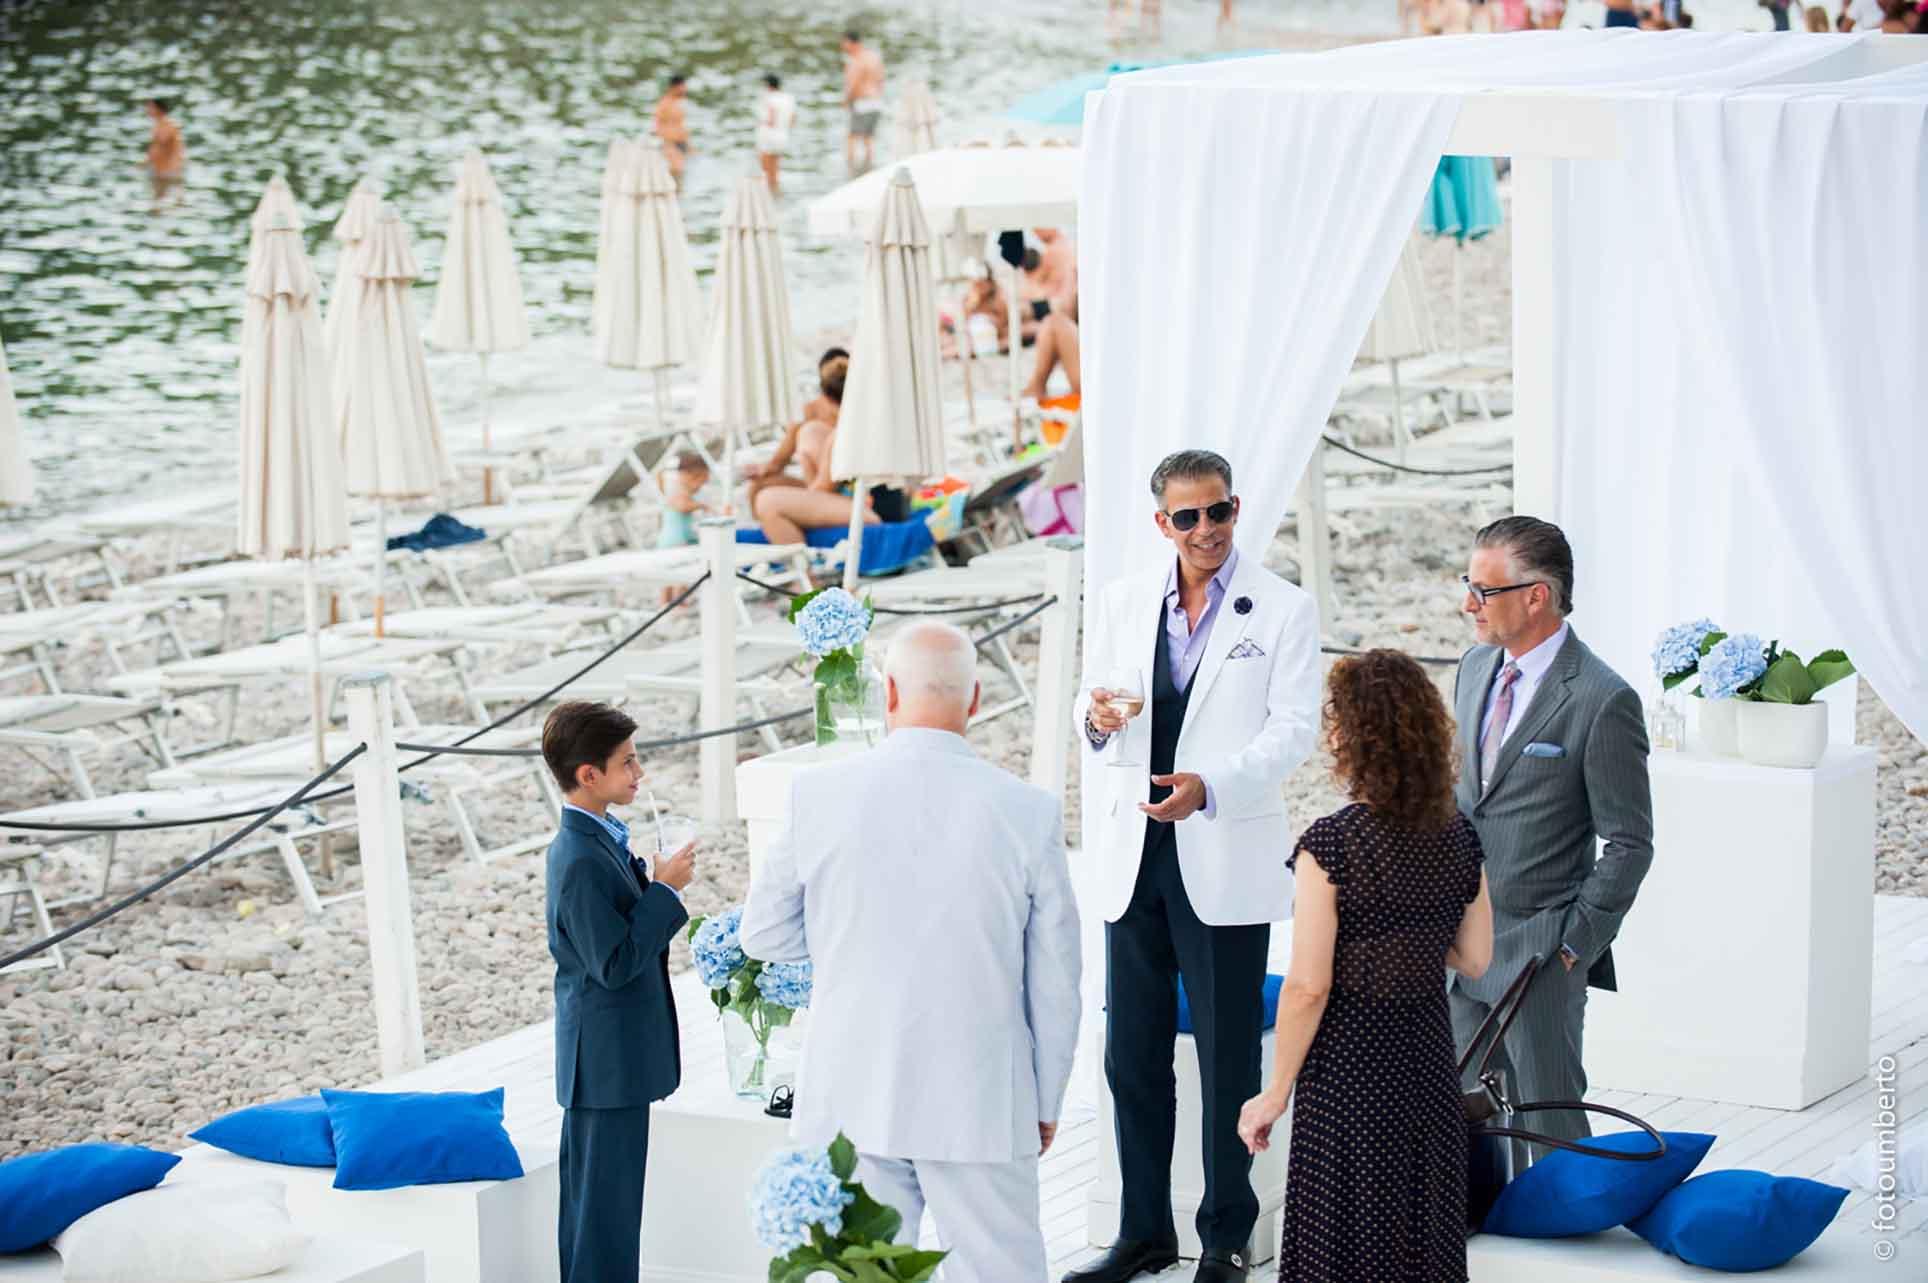 wedding isola bella 2